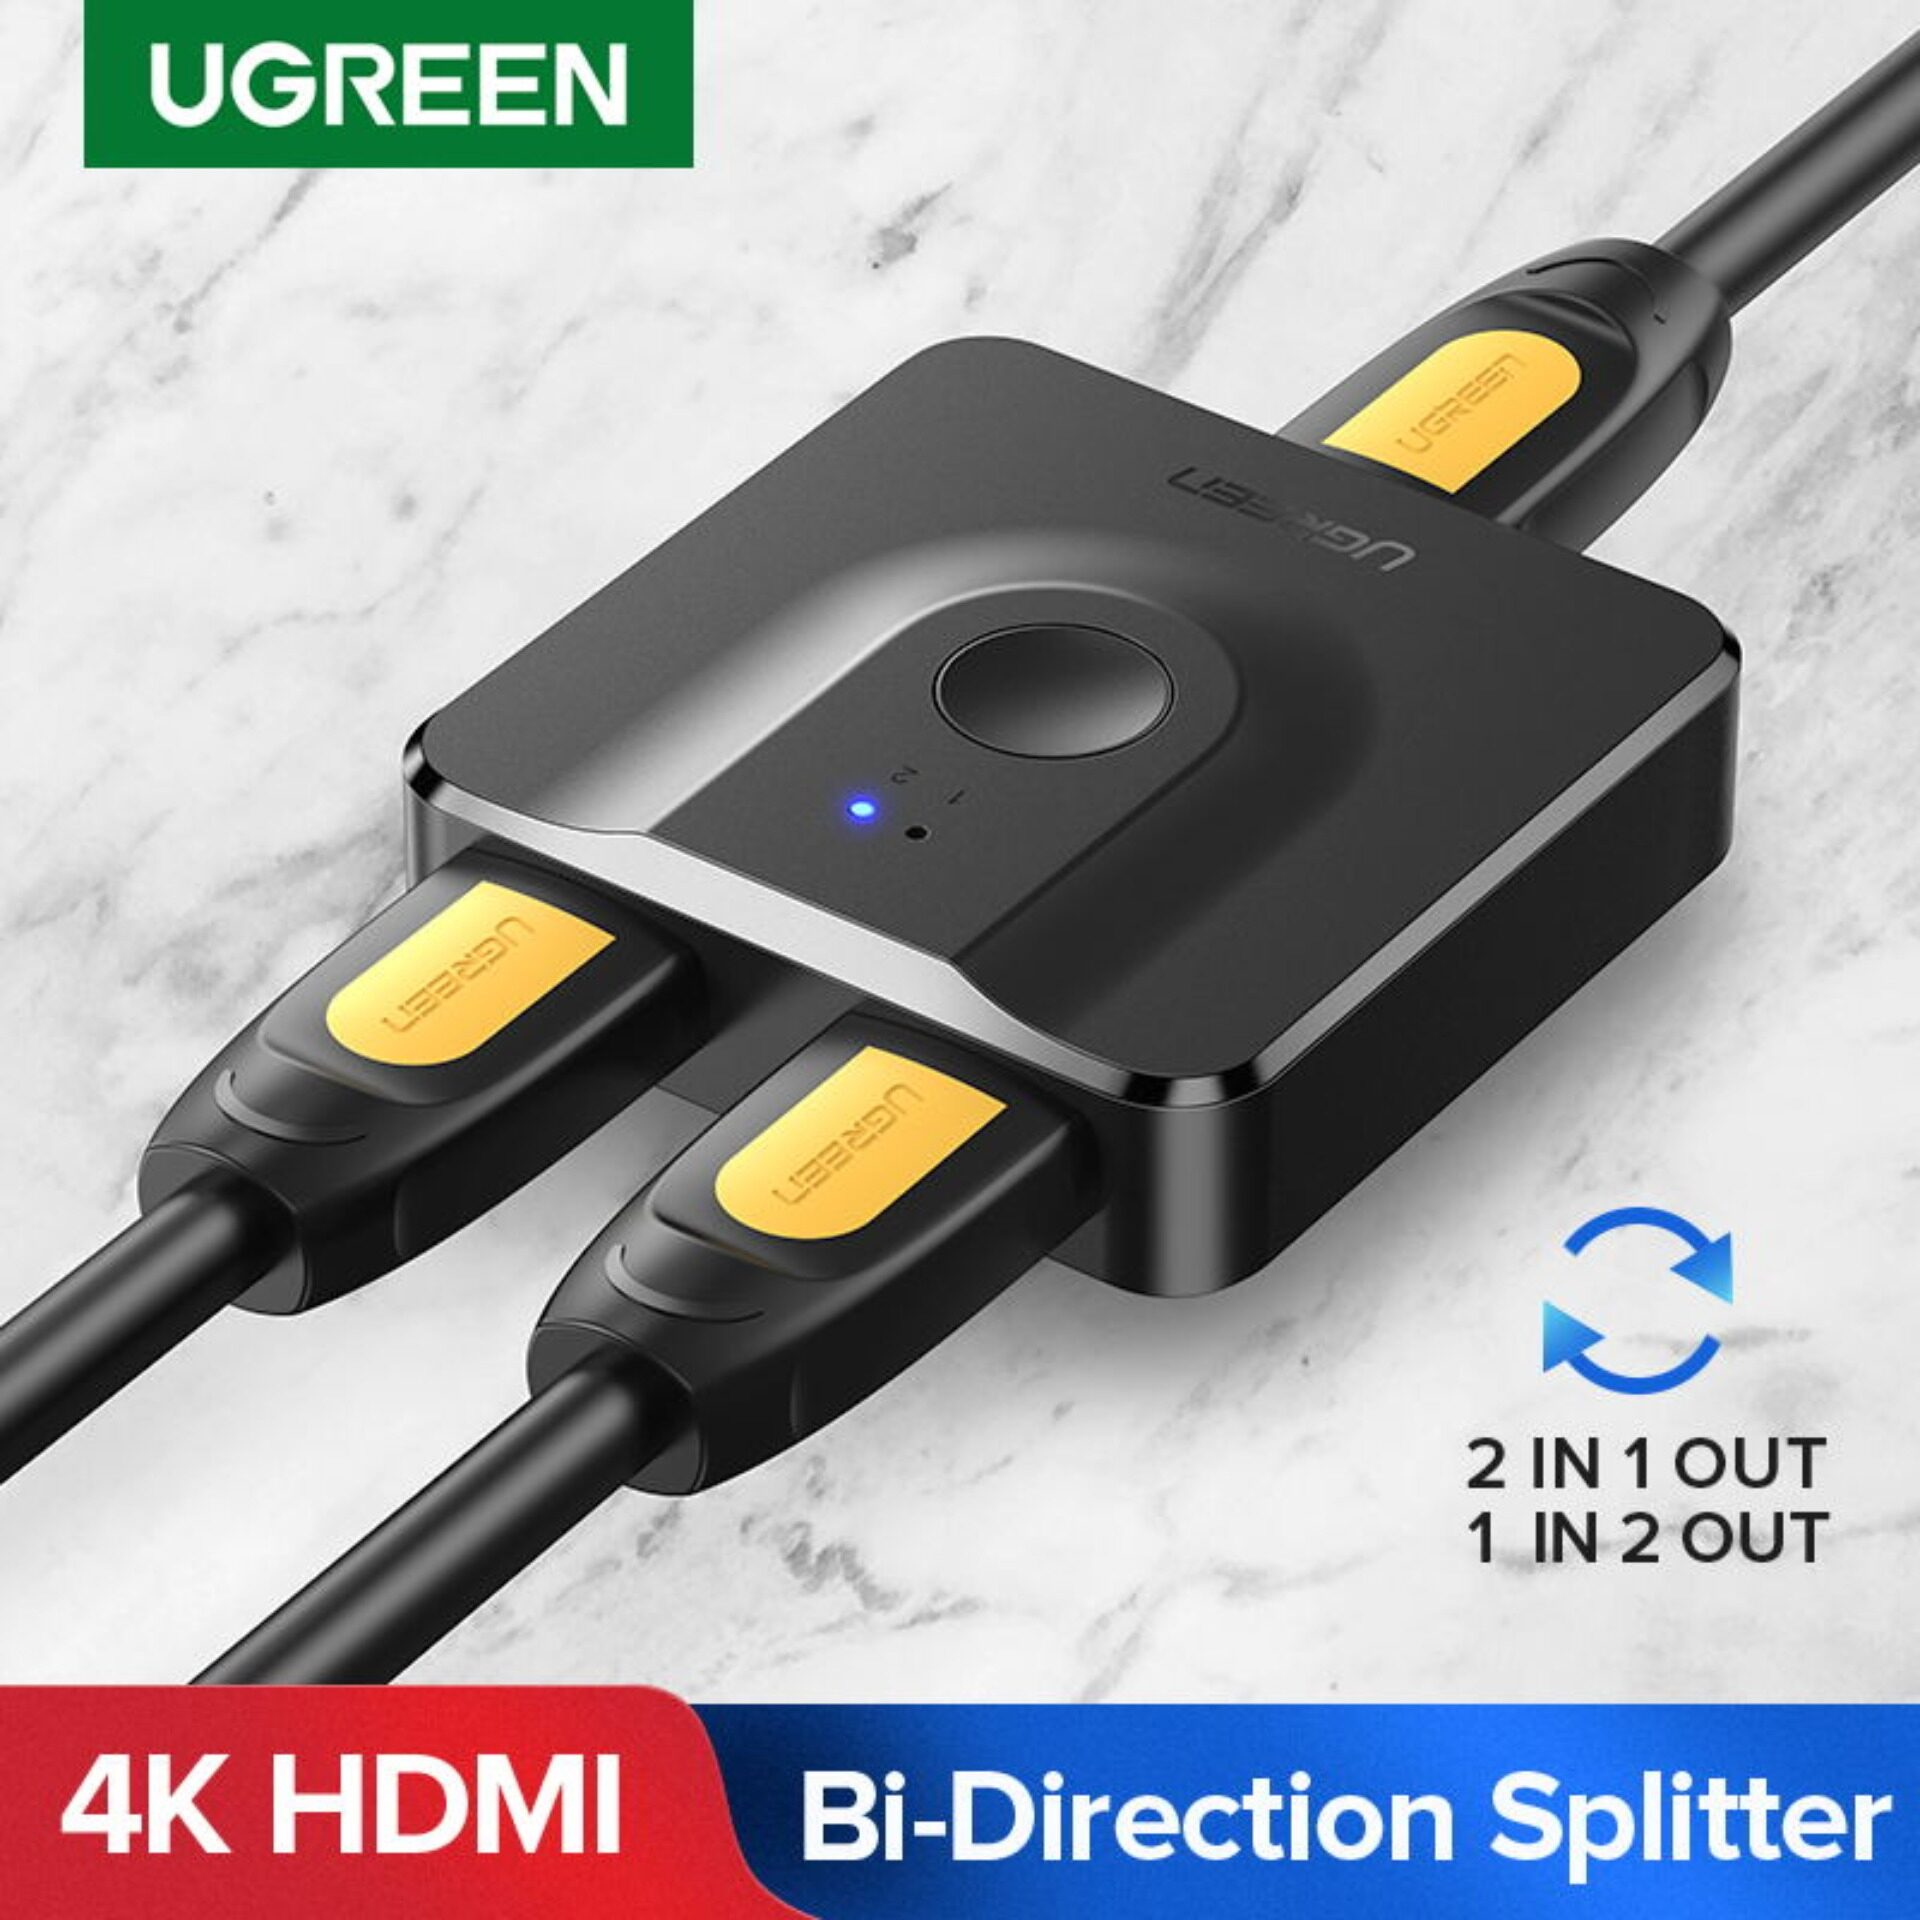 [ugreen] หัวแปลง อะแดปเตอร์ Hdmi คุณภาพ4k 2in1out และ 1in2out สำหรับps4/3 Box มอนิเตอร์รับสส่งภาพทั่วไป Hdmi Splitter 4k Hdmi Switch Bi-Direction.